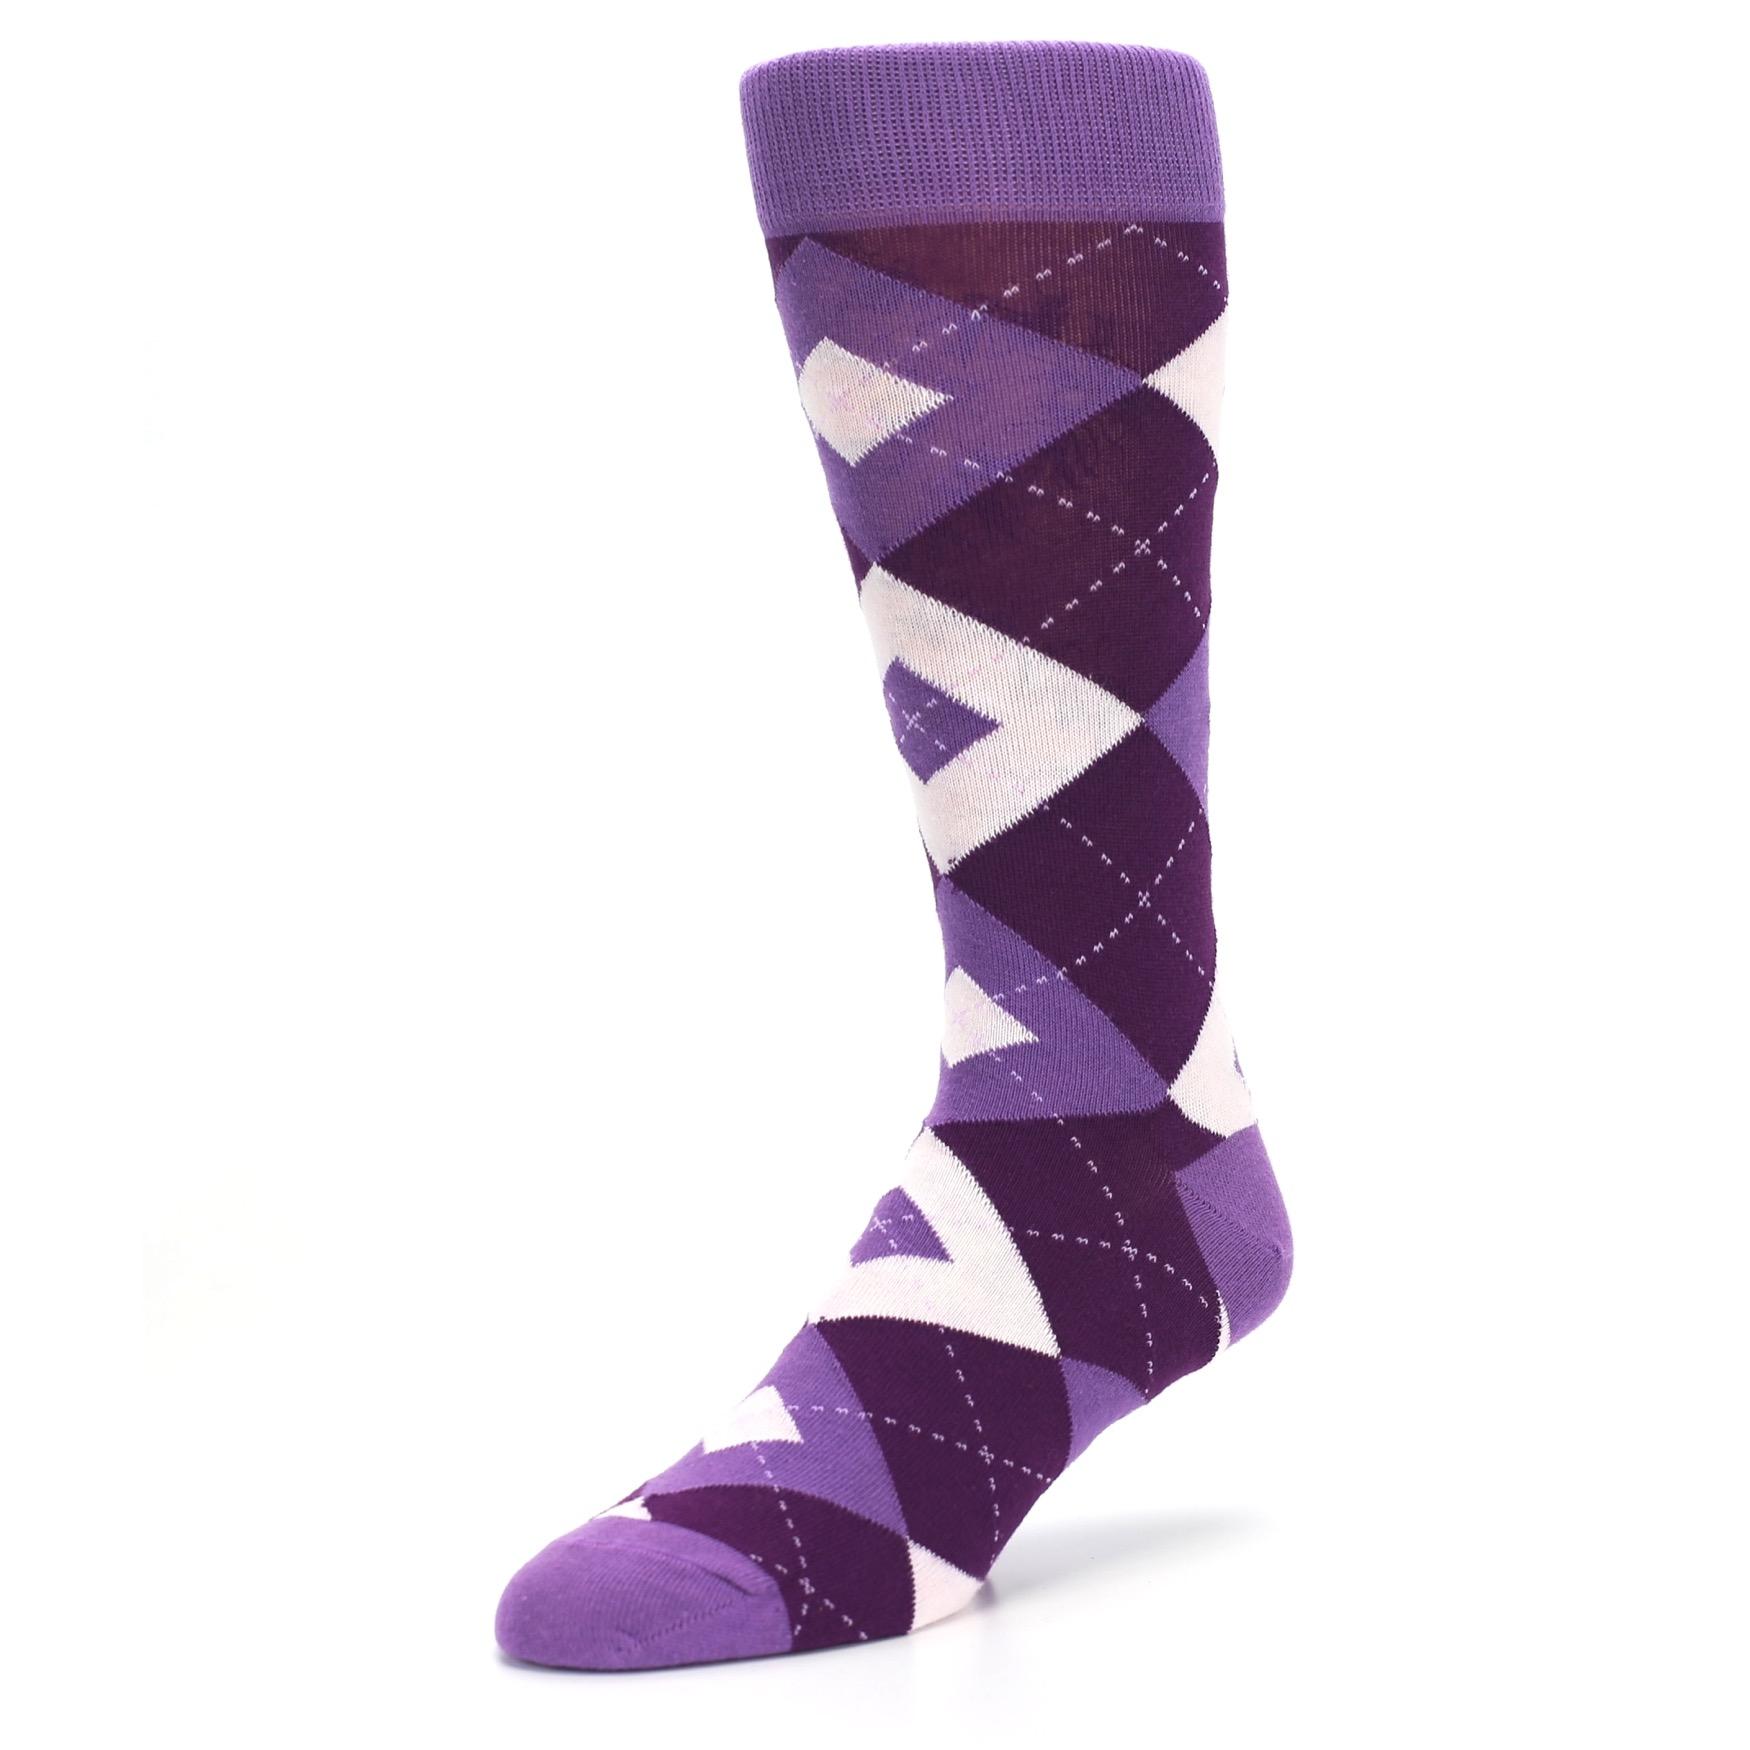 Wisteria Plum Argyle Wedding Groomsmen Men's Dress Socks